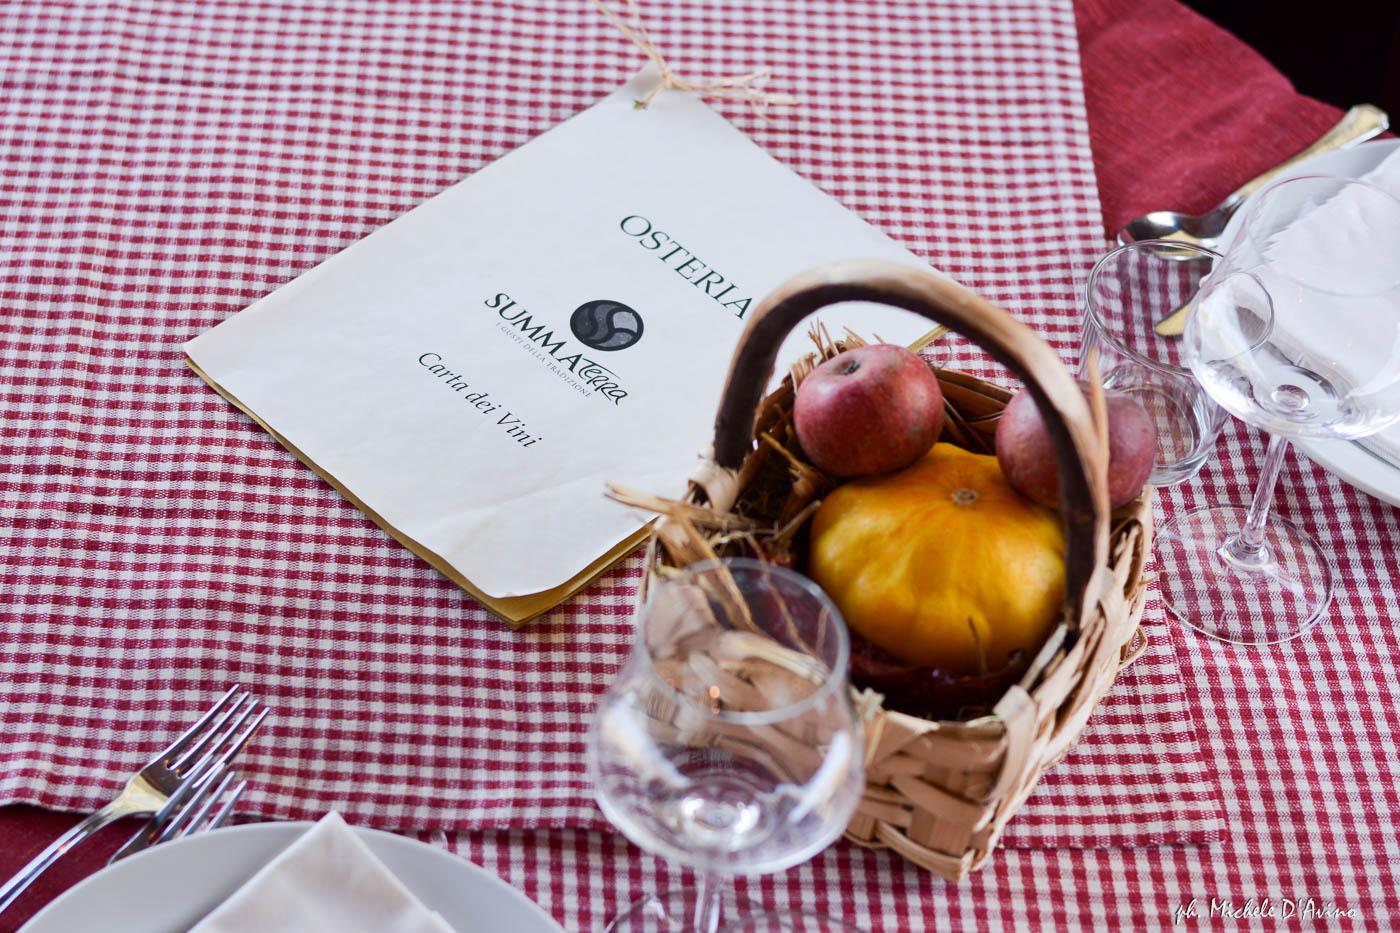 osteria-summa-terra-baccala-food-experience--1